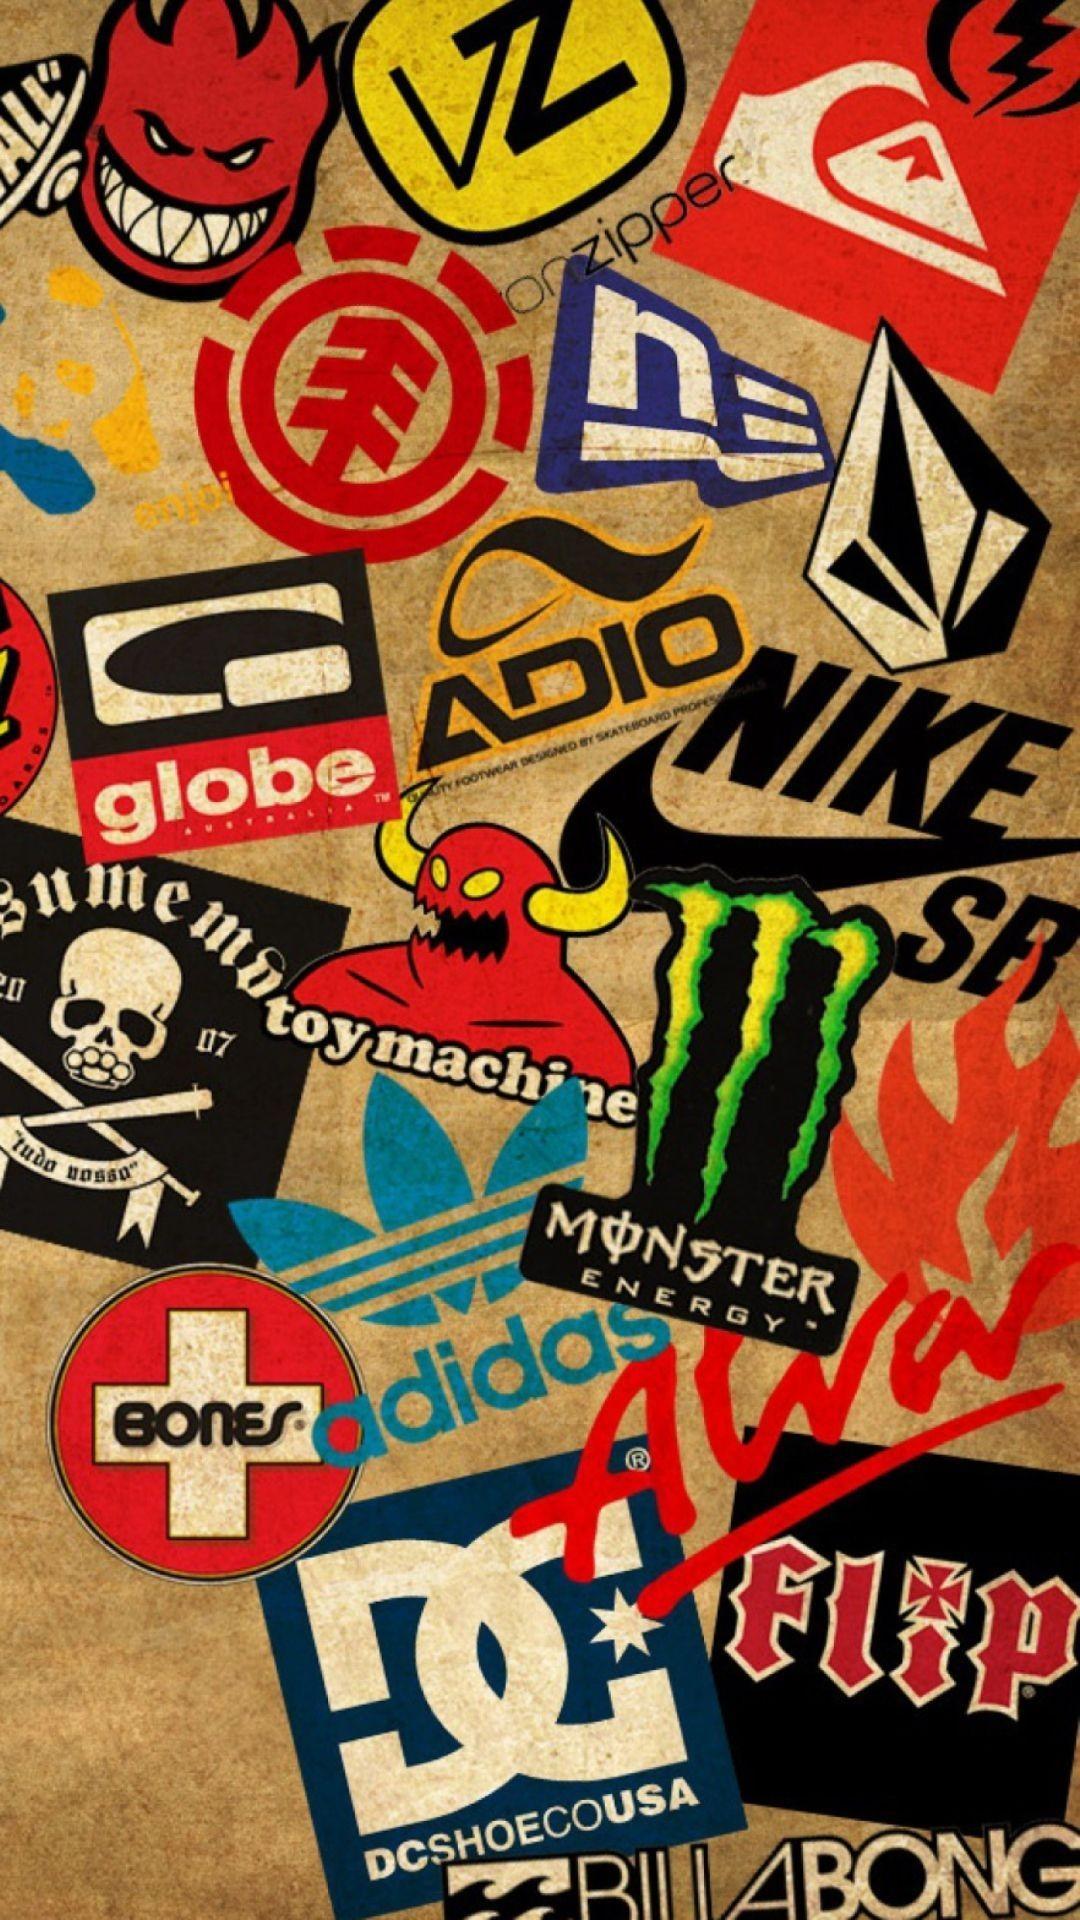 Skateboard-Logos-1080×1920.jpg